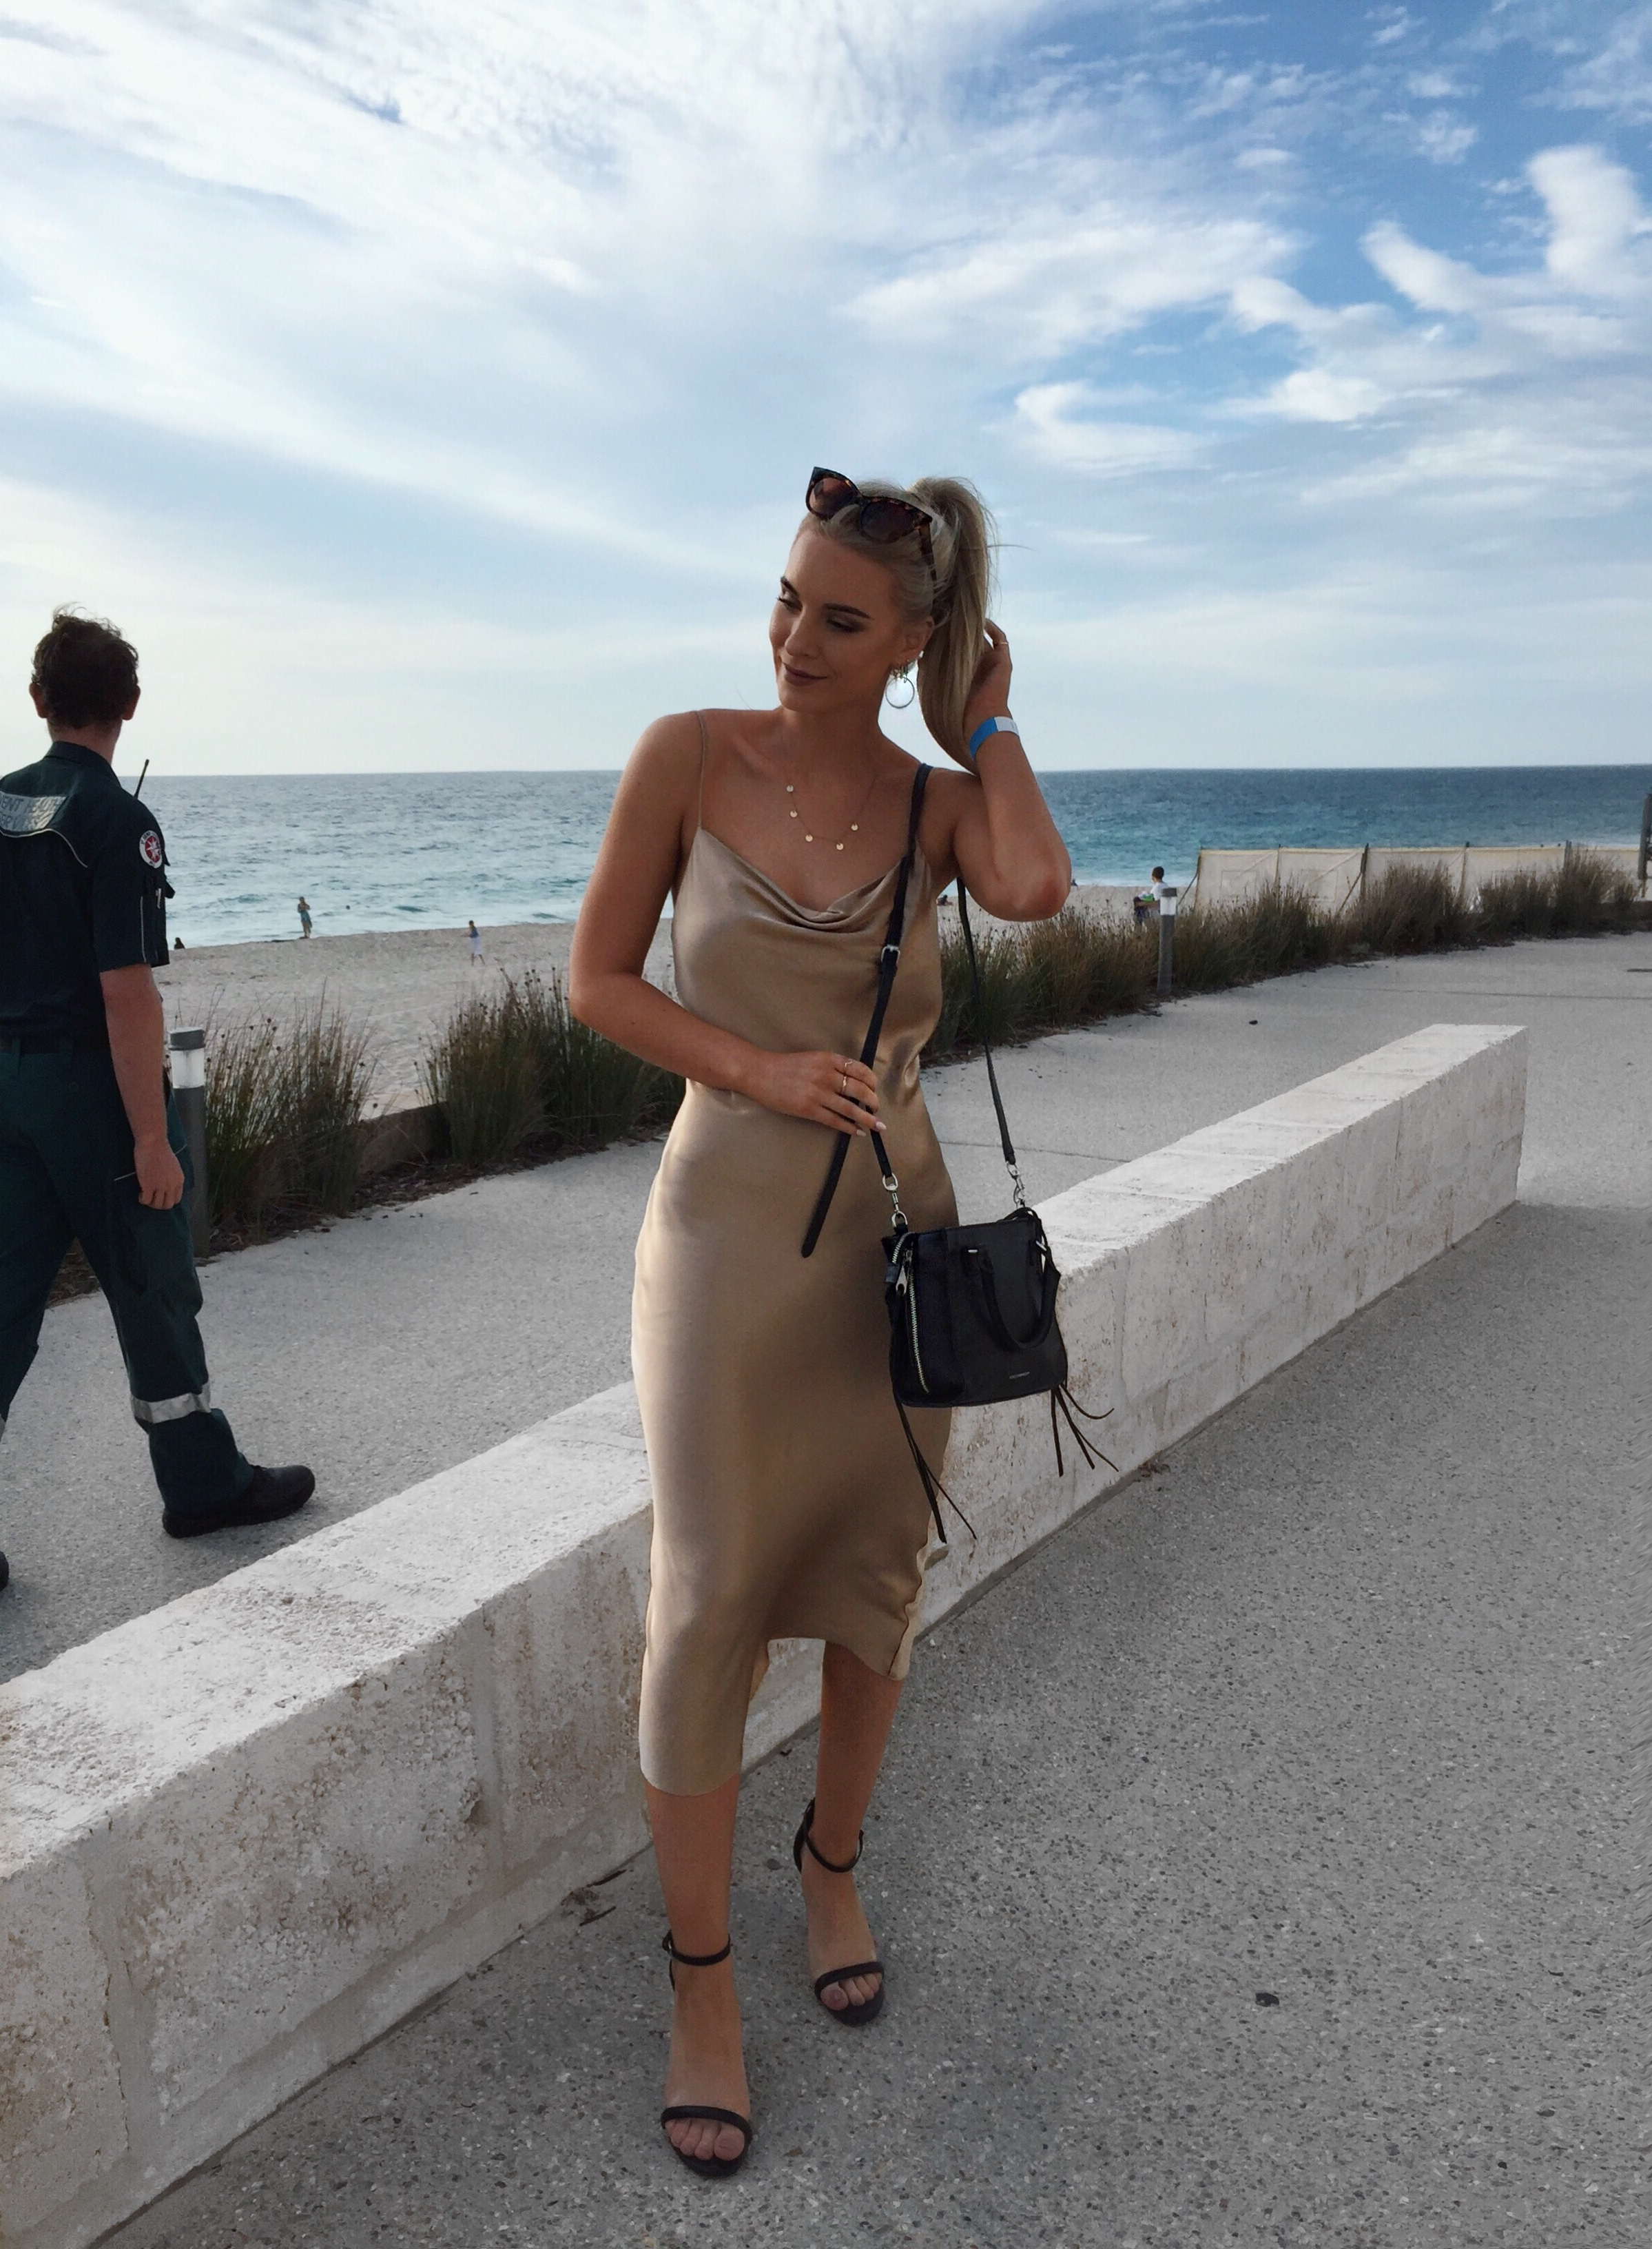 Izzy Smith at Swim Resort 2017 Perth Blogger - Bec and Bridge Gold Dress